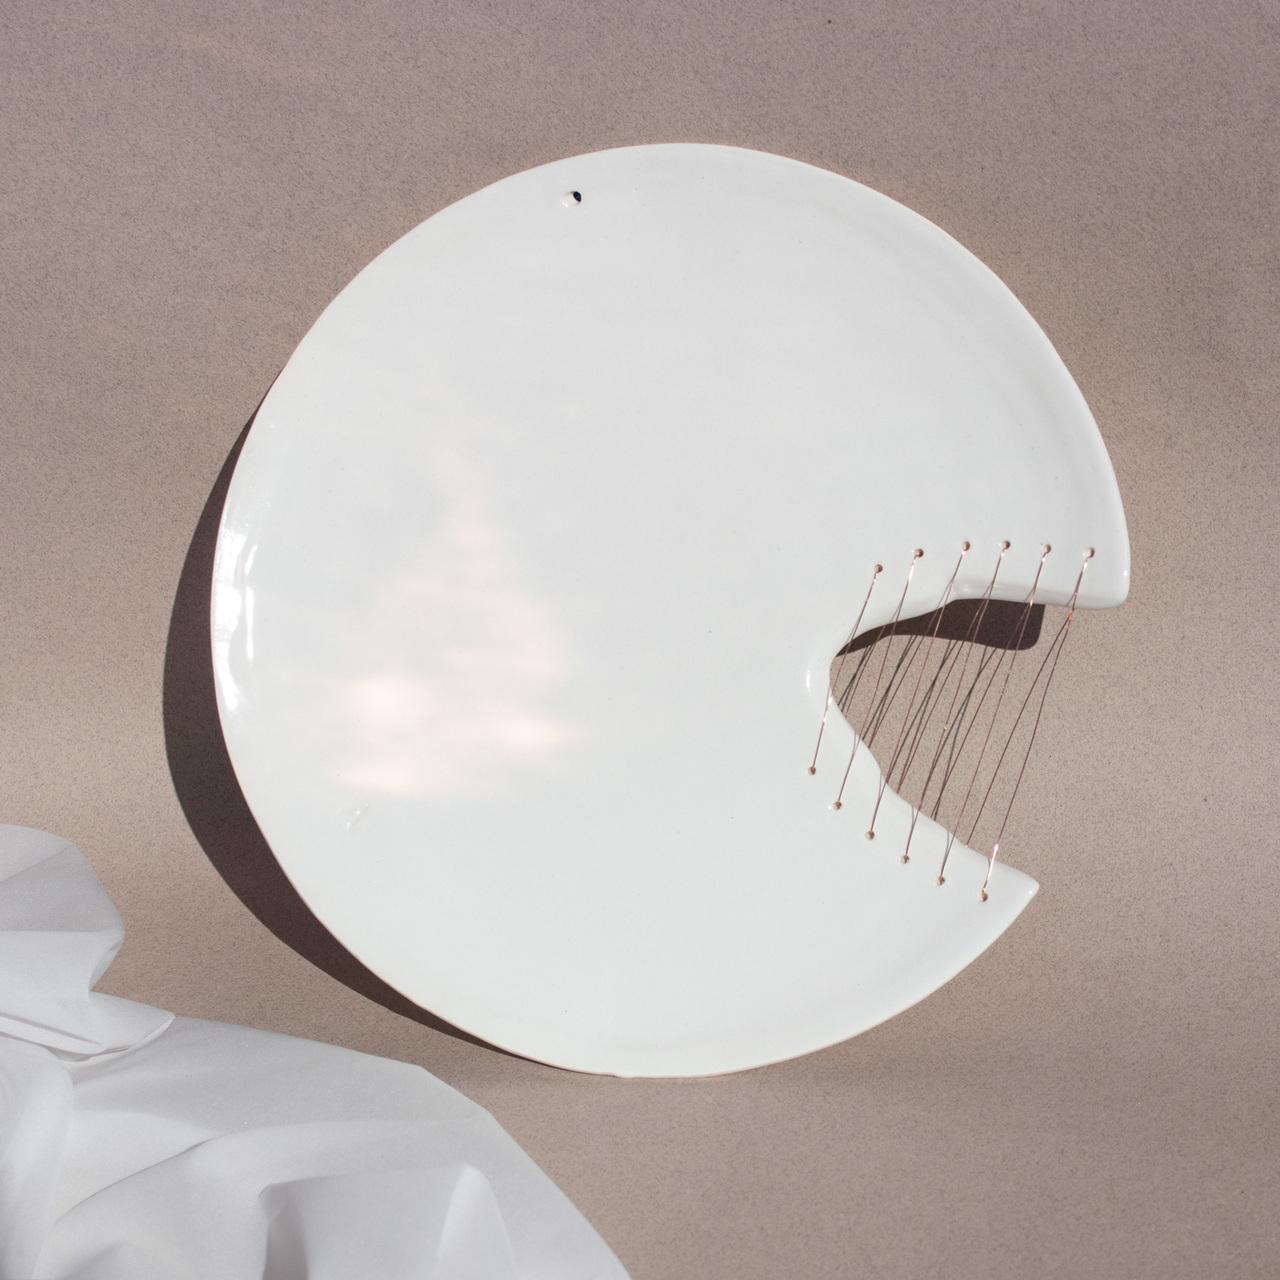 Alia Stitched Ceramic Plate